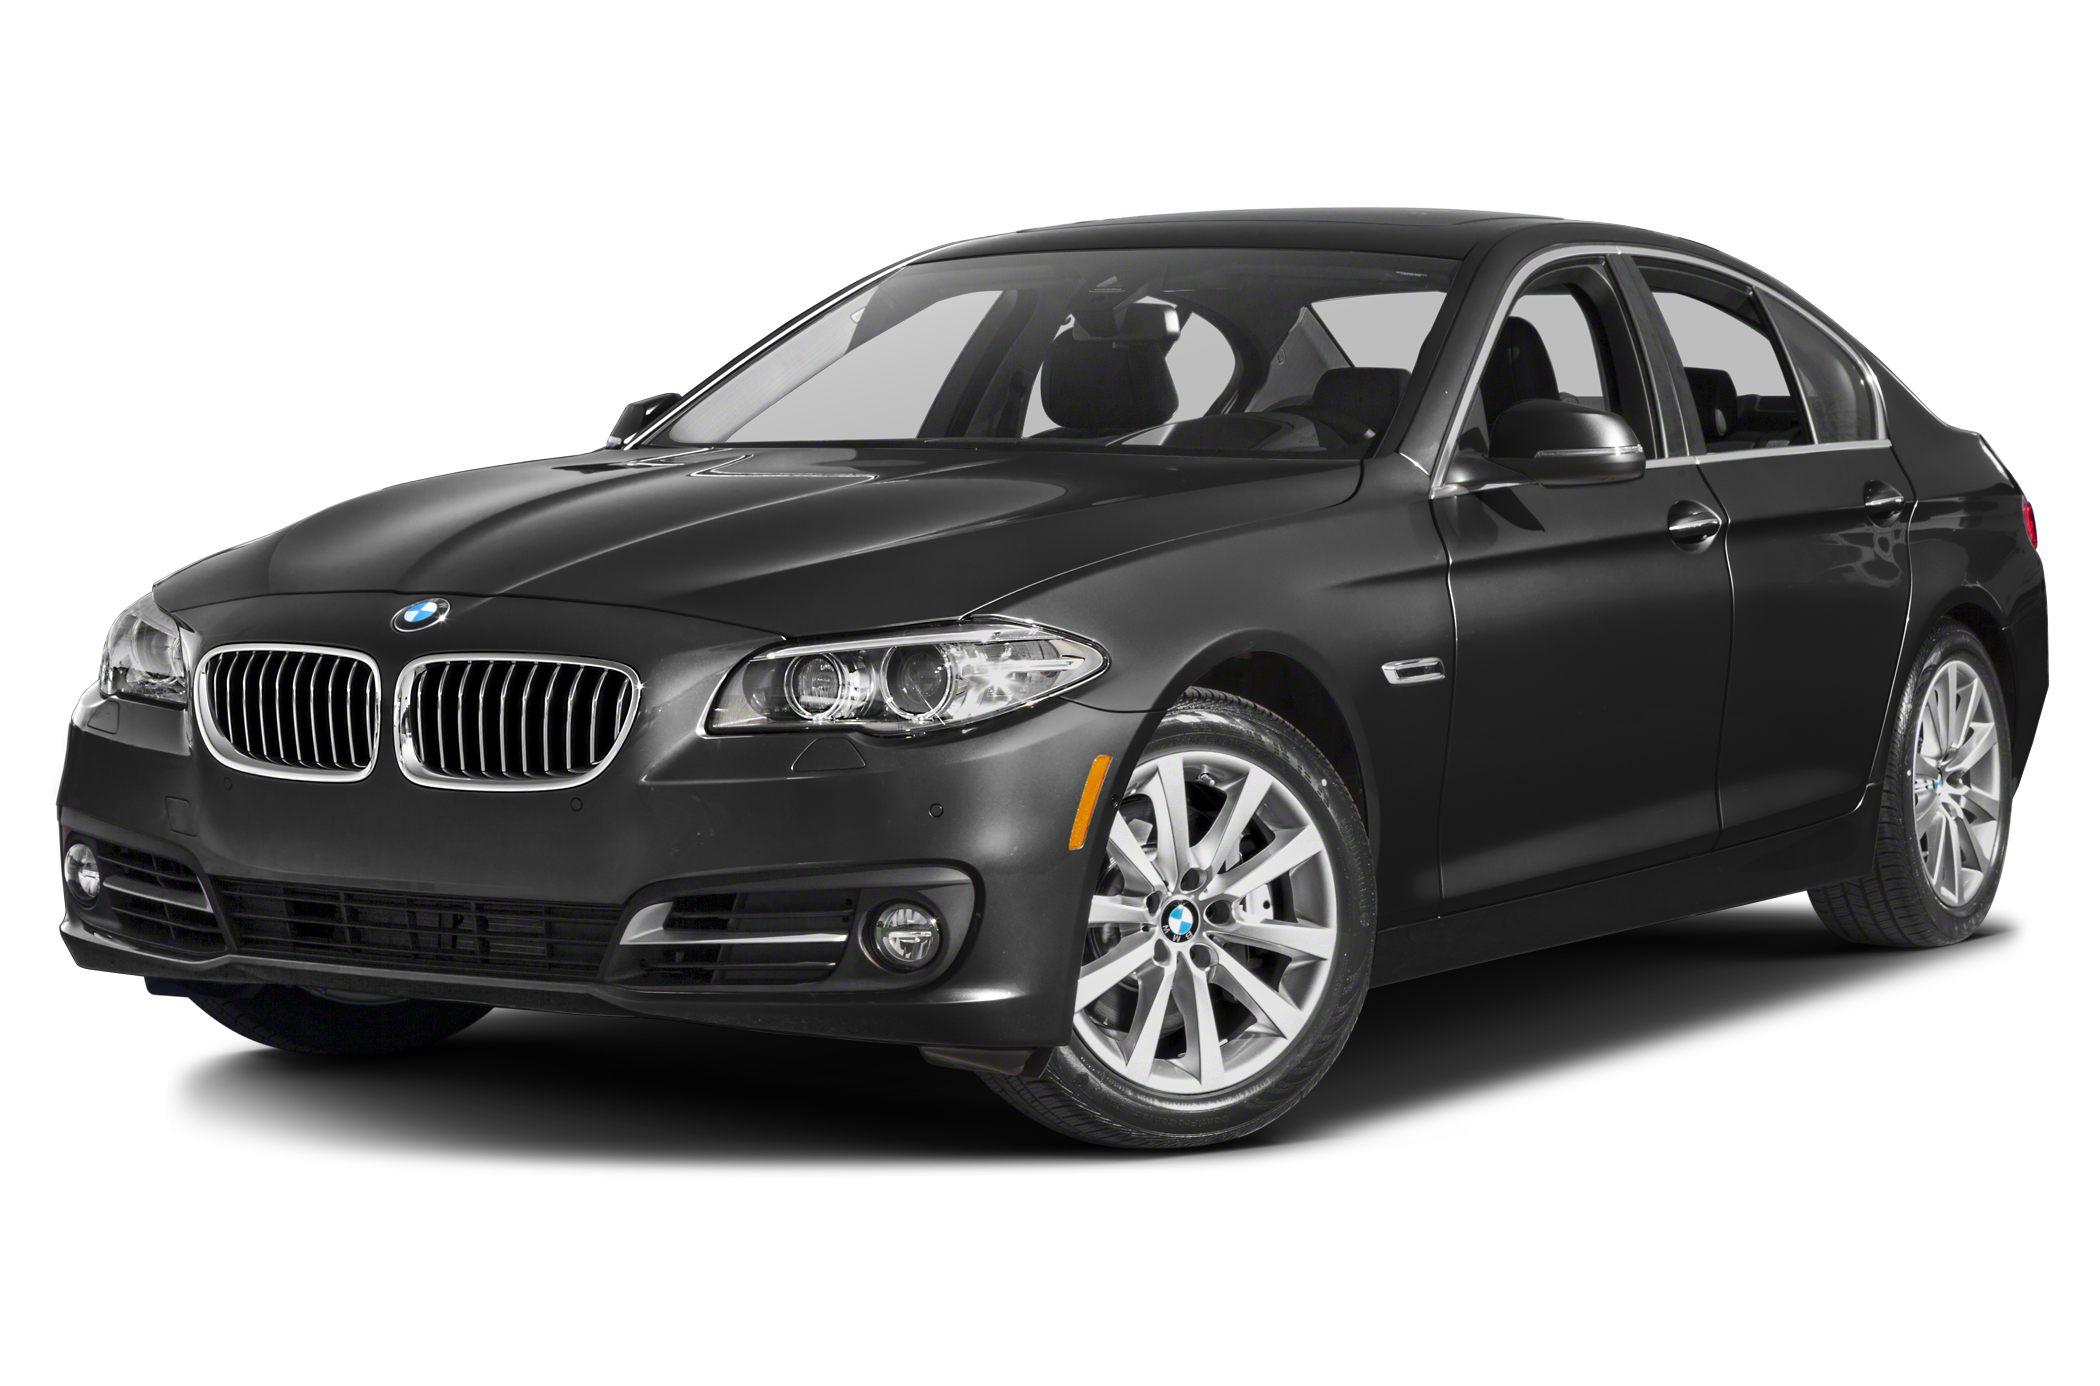 Bmw 535 Sedan Models Price Specs Reviews Cars Com